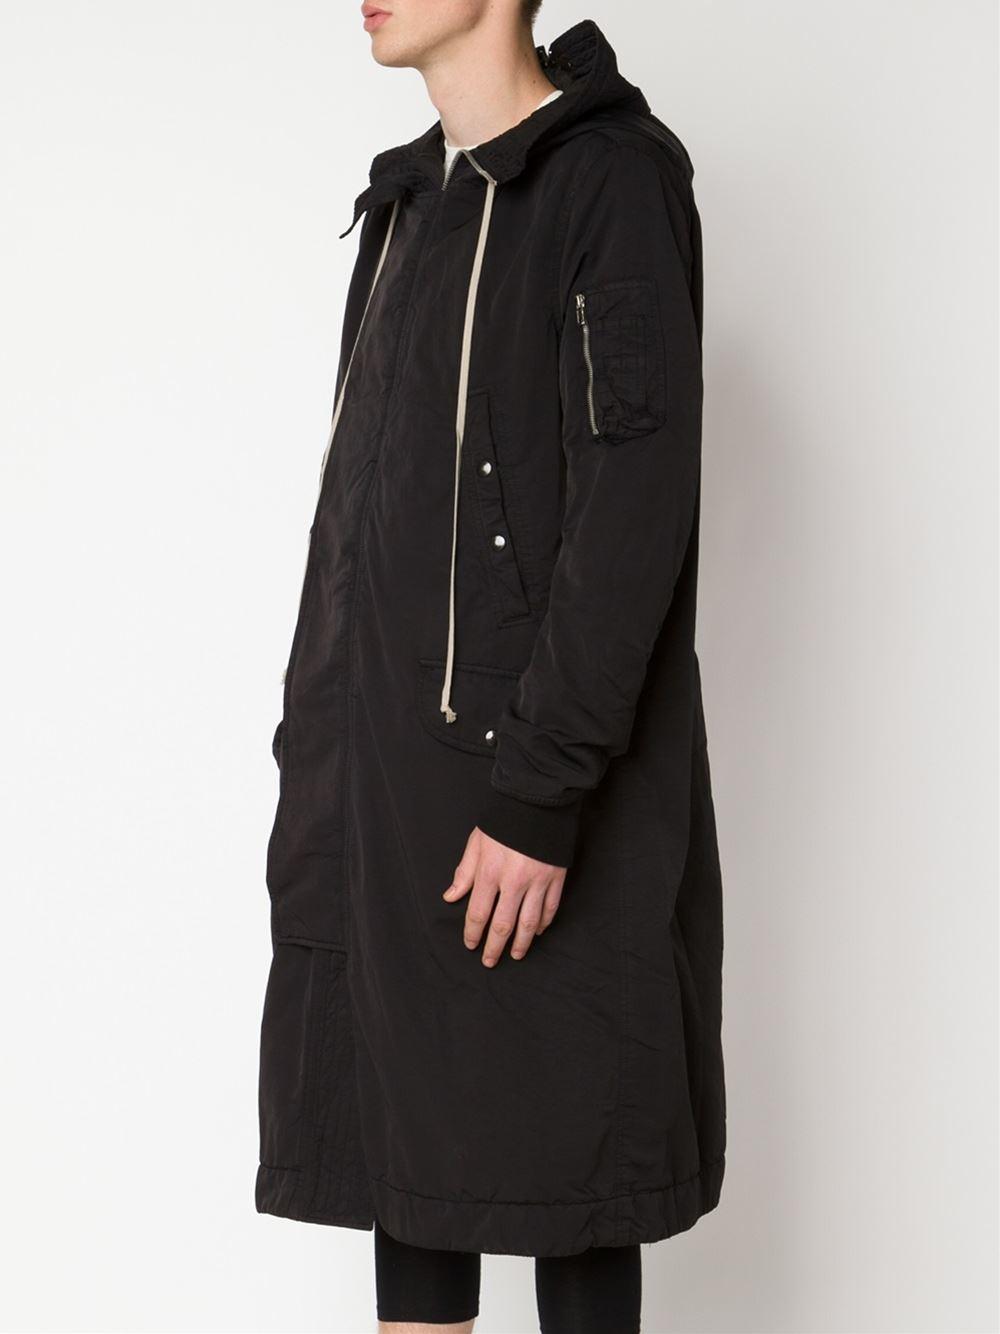 Drkshdw by rick owens Hooded Parka in Black for Men | Lyst